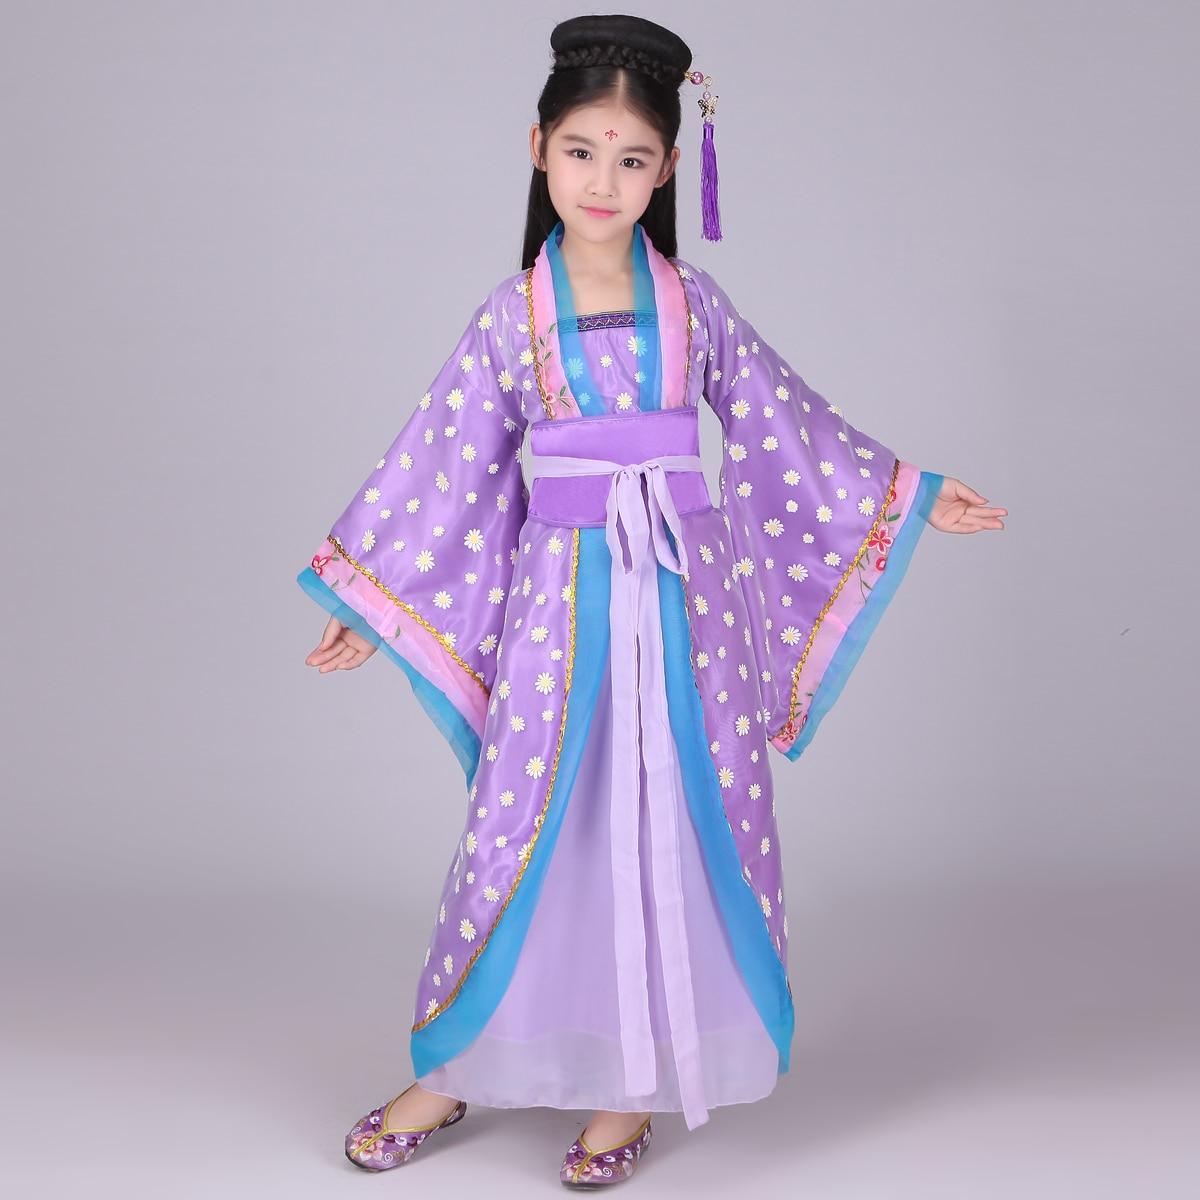 Traditionele Chinese Volksdans Dance Kostuums Meisje Kids Kinderen Oude Opera Tang-dynastie Han Ming Kind Hanfu Jurk Kleding Zo Effectief Als Een Fee Doet